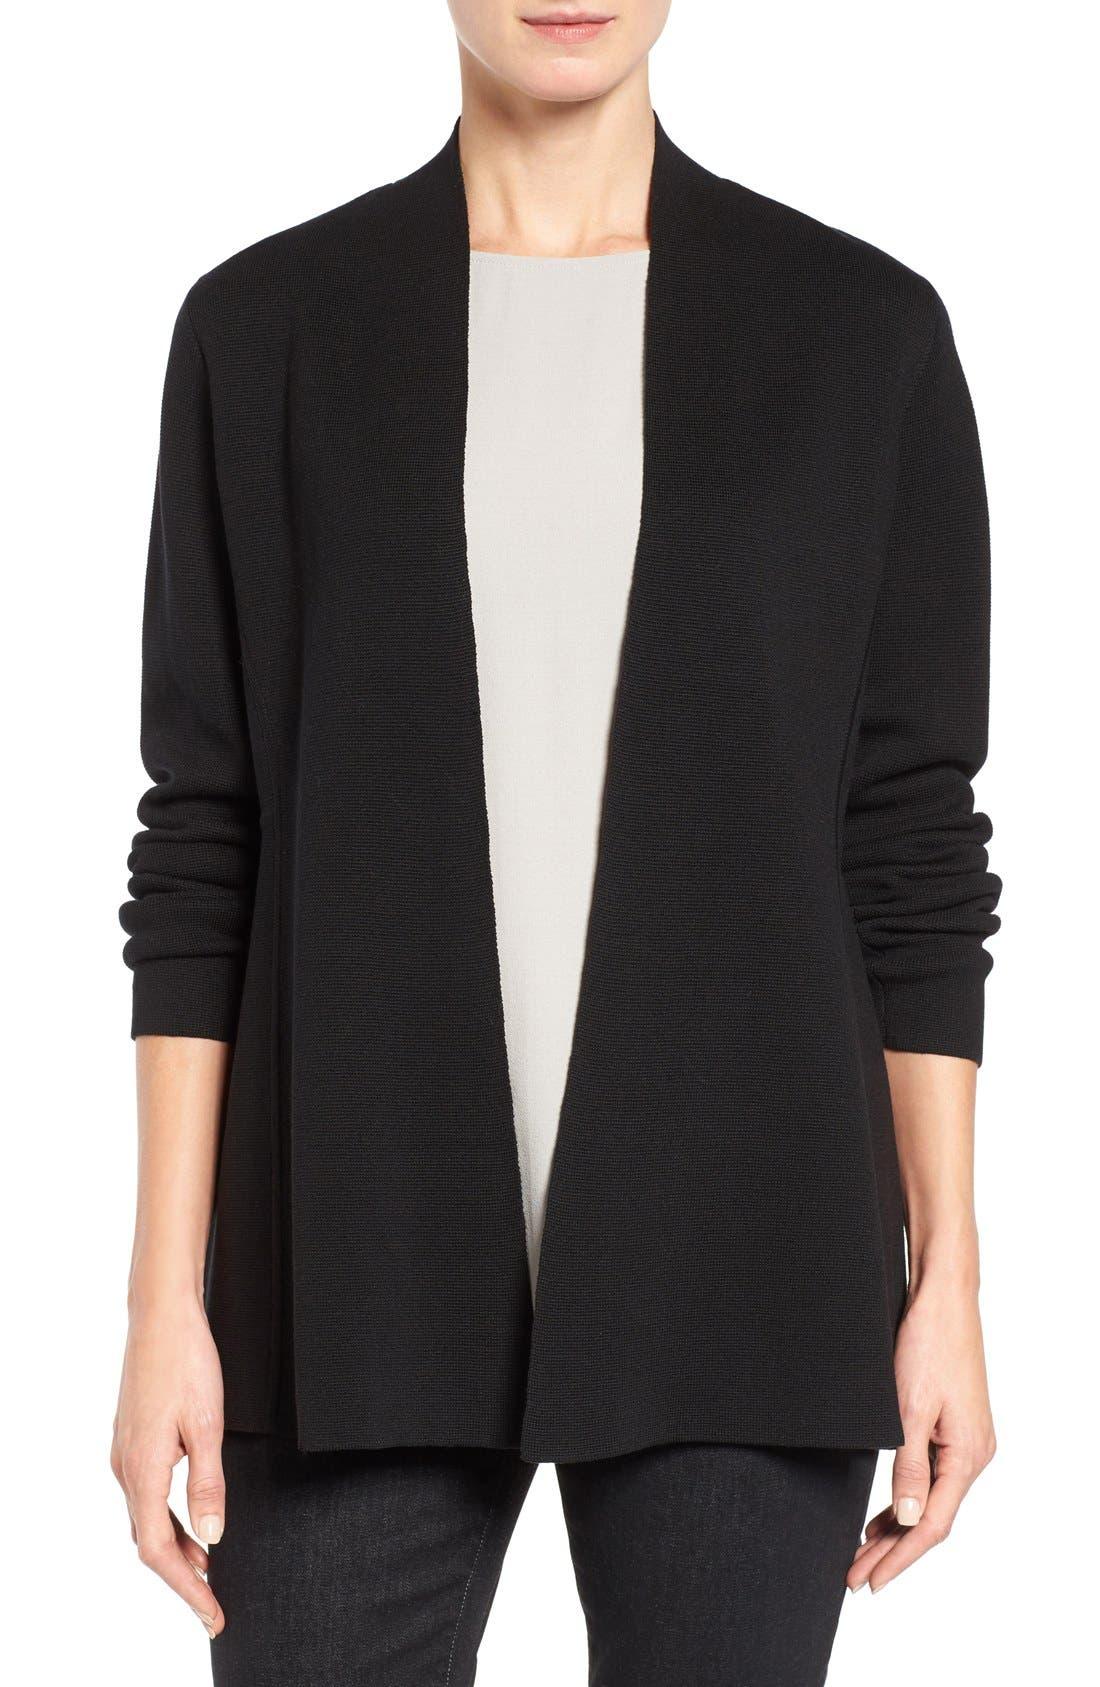 Eileen Fisher Silk & Organic Cotton Cardigan (Nordstrom Exclusive)